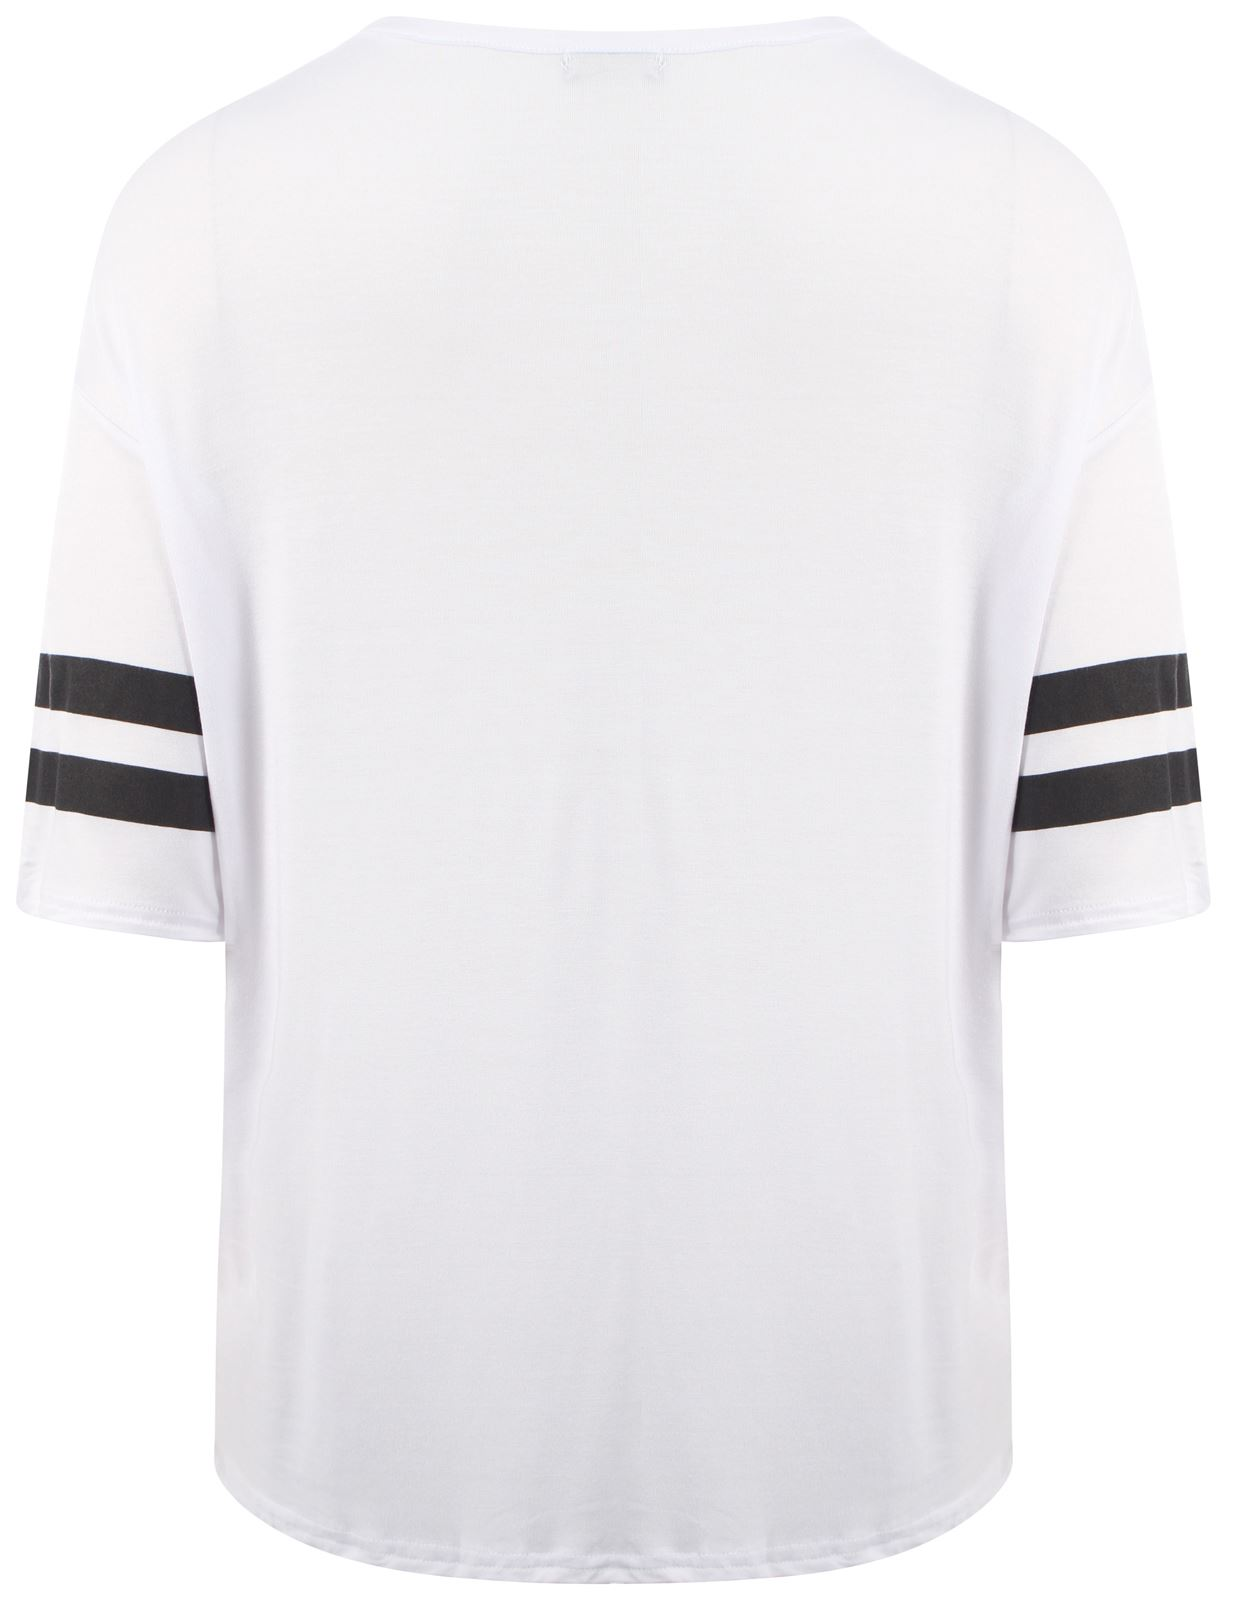 af0a910f4d5e New Womens Oversize Varsity 98 Number Baggy T Shirt Tops 12-26 | eBay